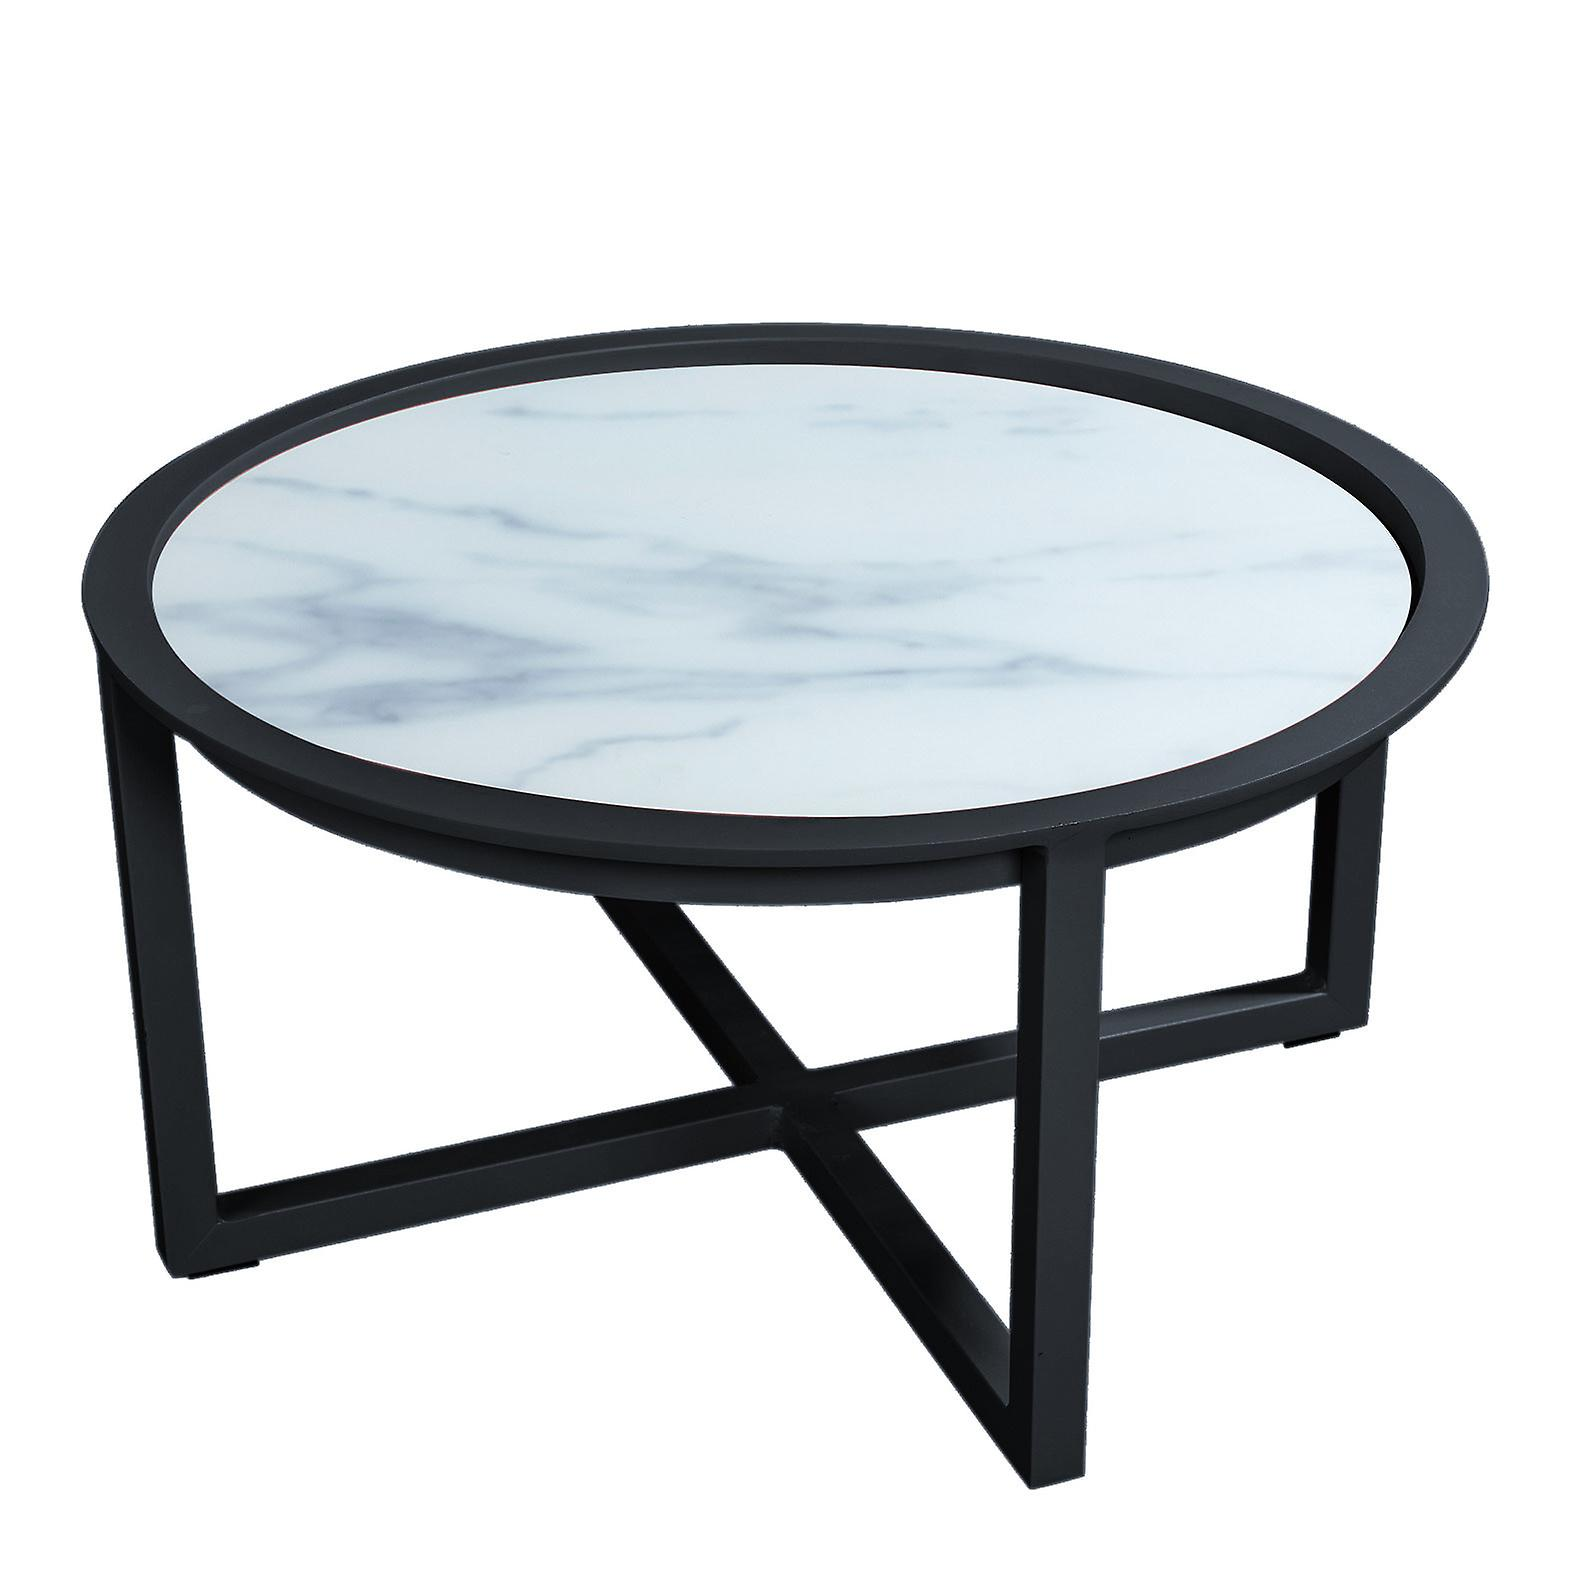 Plage7 - France QUEENS LOUNGE TABLE Alum/GLASS Marble Look 75CM  Noir